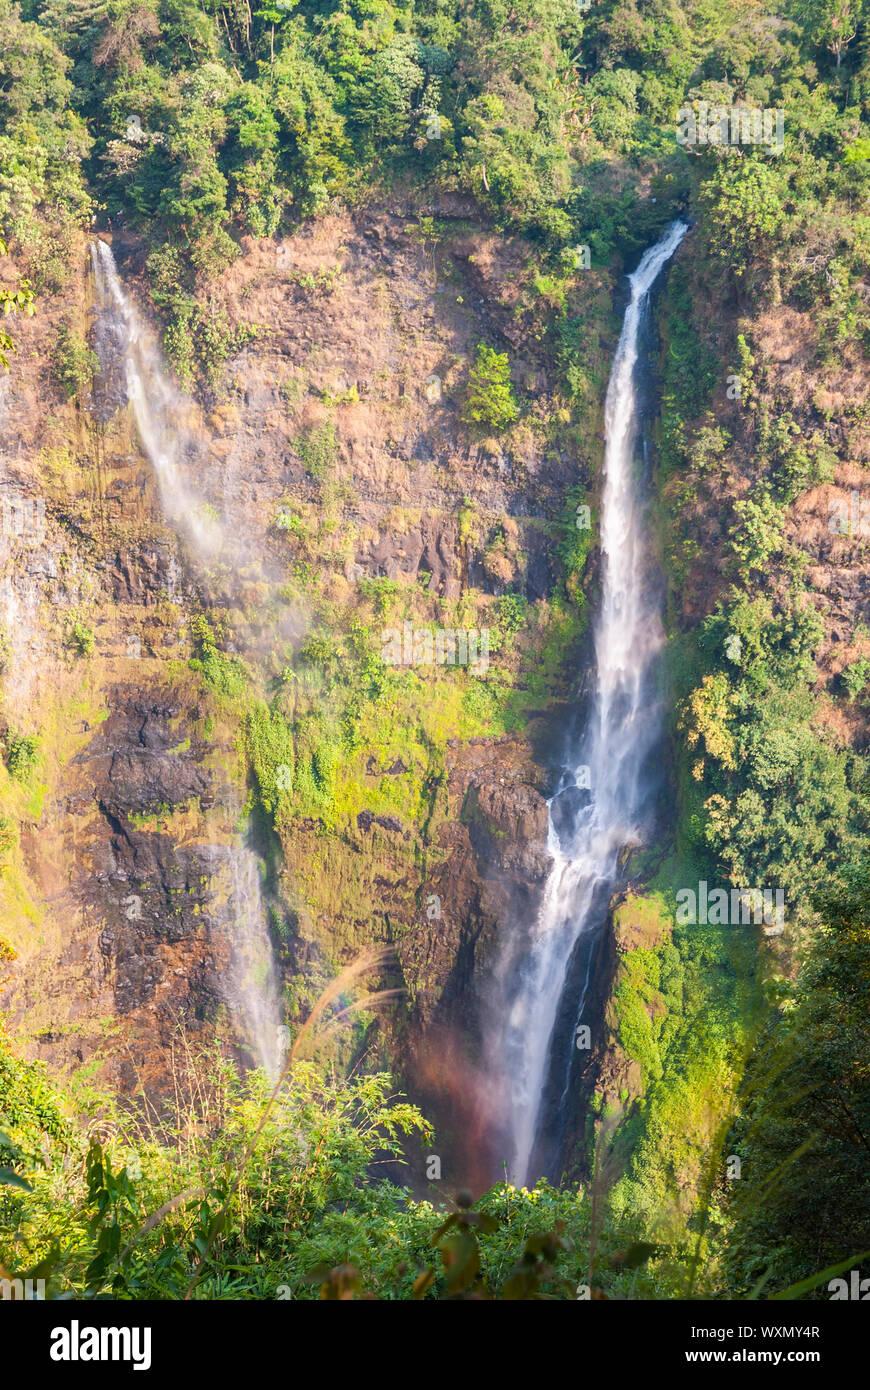 Atemberaubende Tad Fane Wasserfall von oben, Paksong, Laos Stockfoto